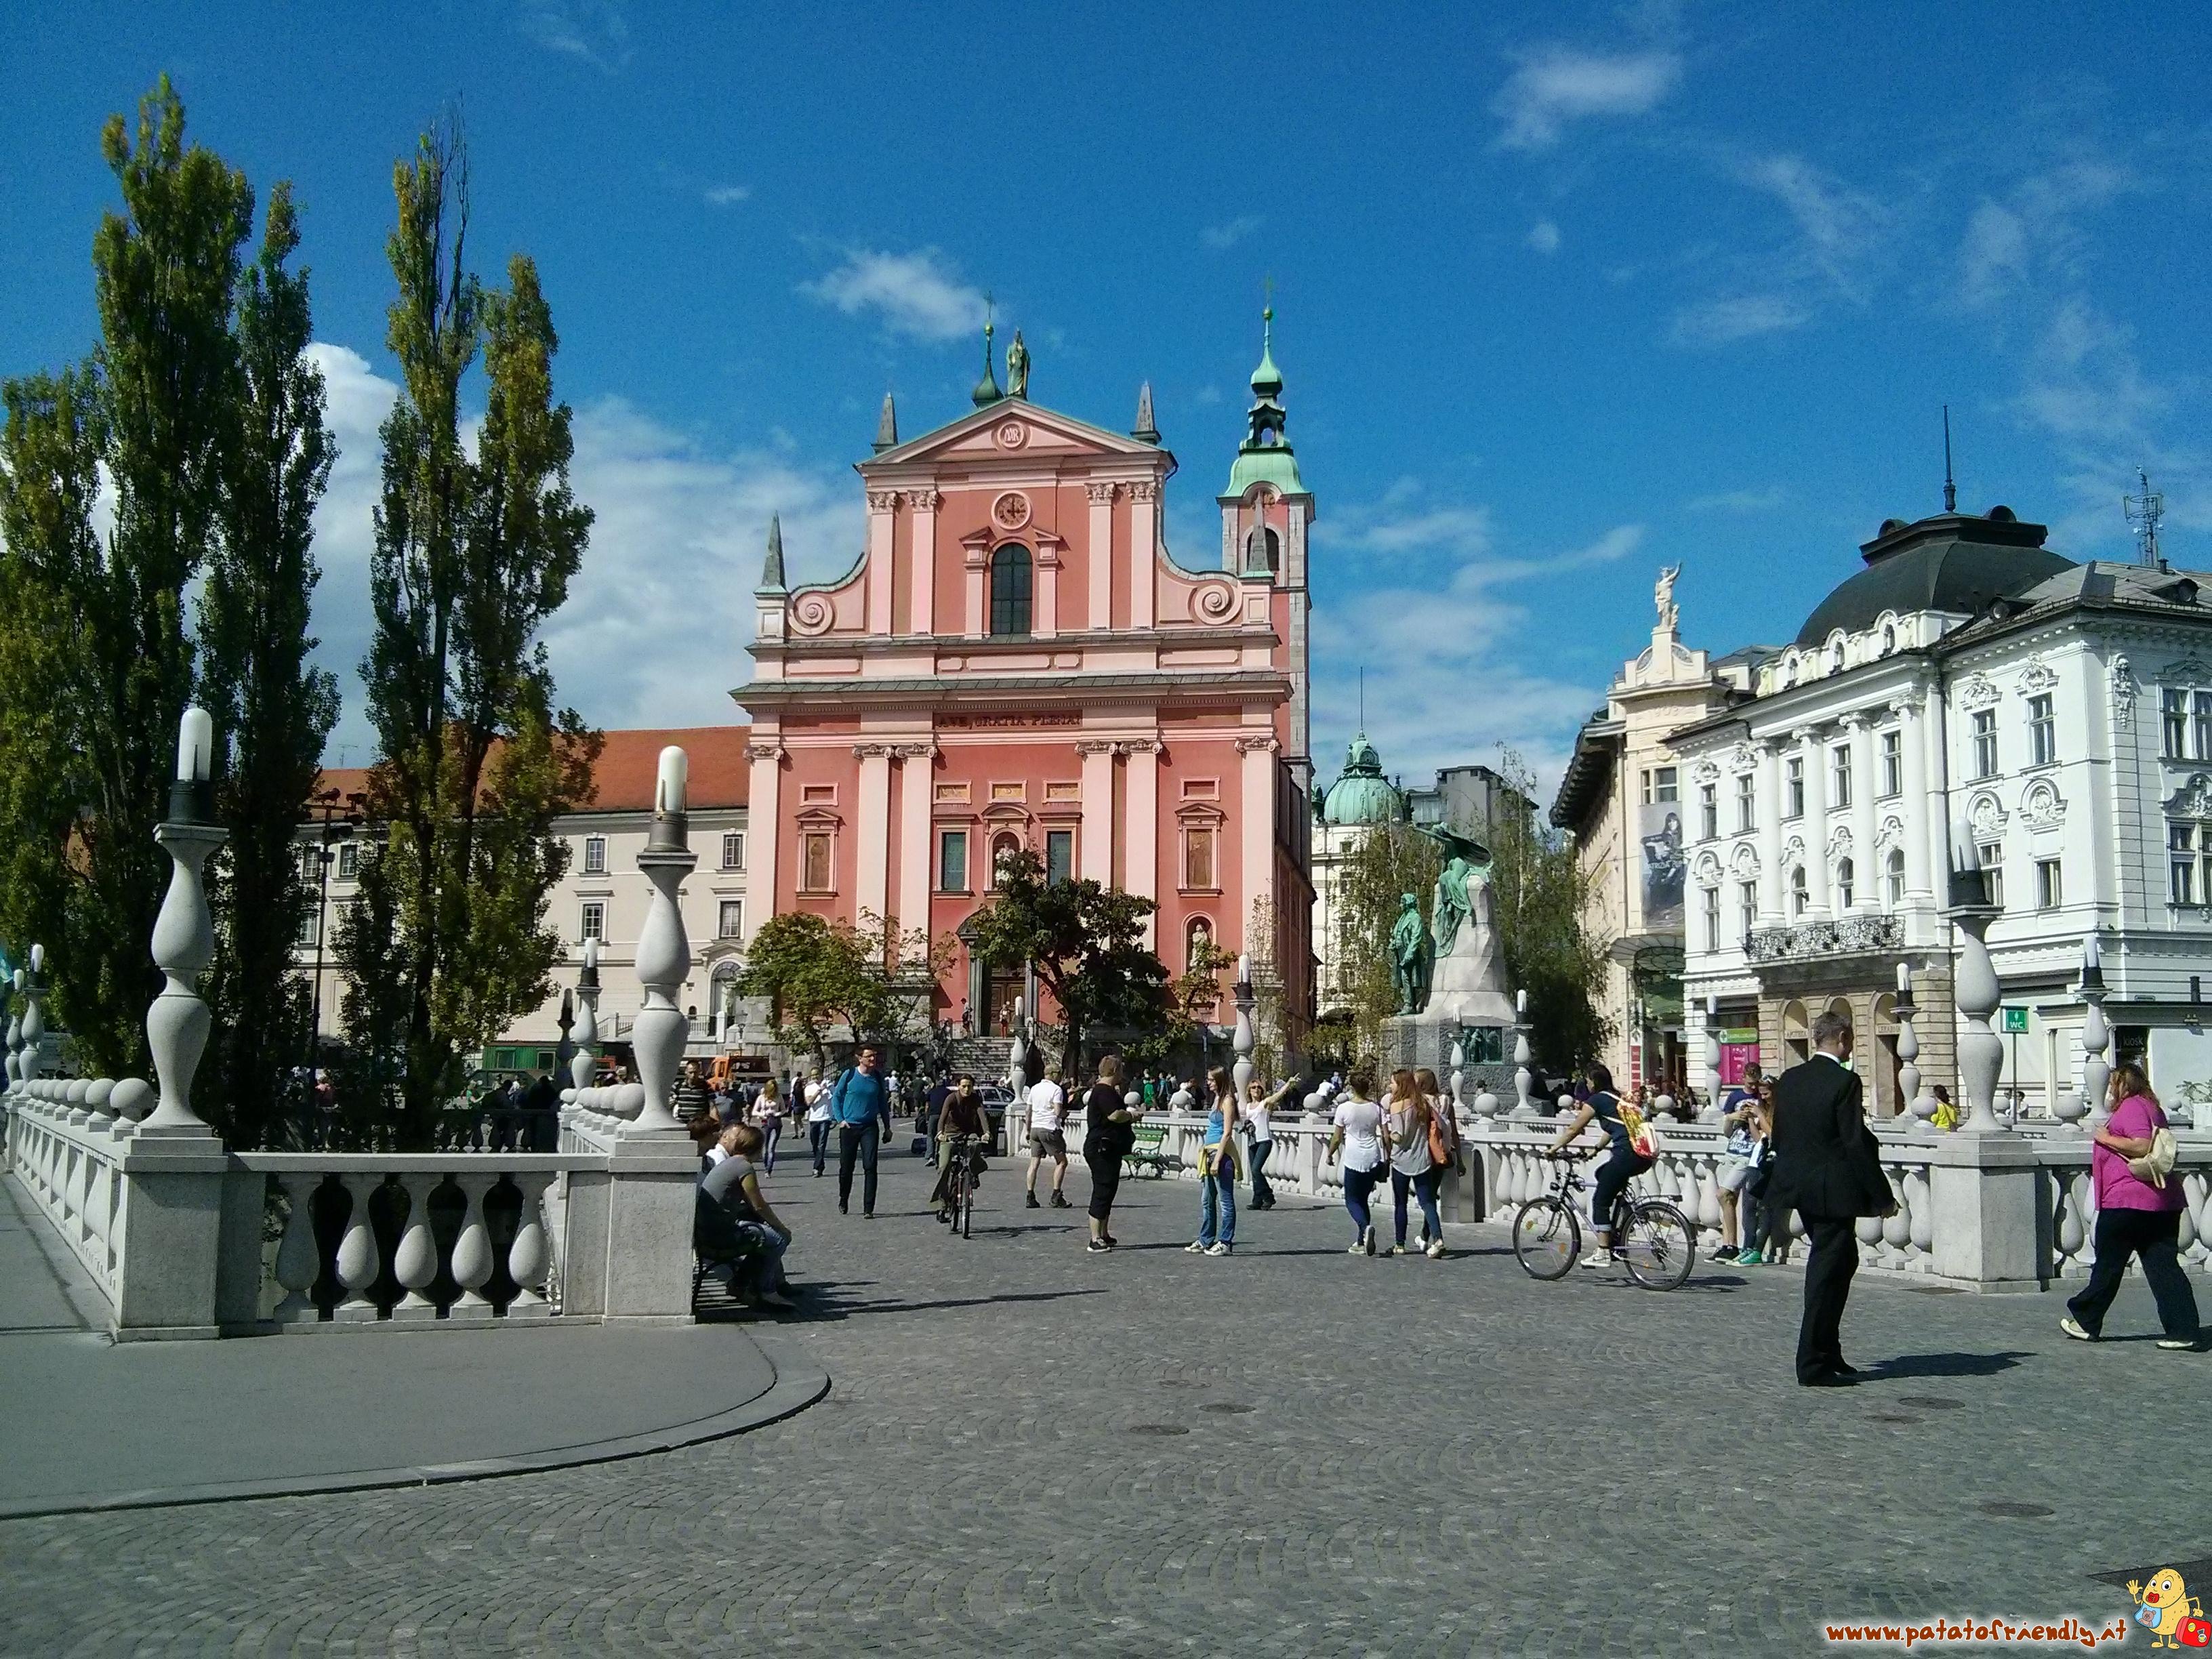 [cml_media_alt id='3829']Il centro storico di Lubiana[/cml_media_alt]